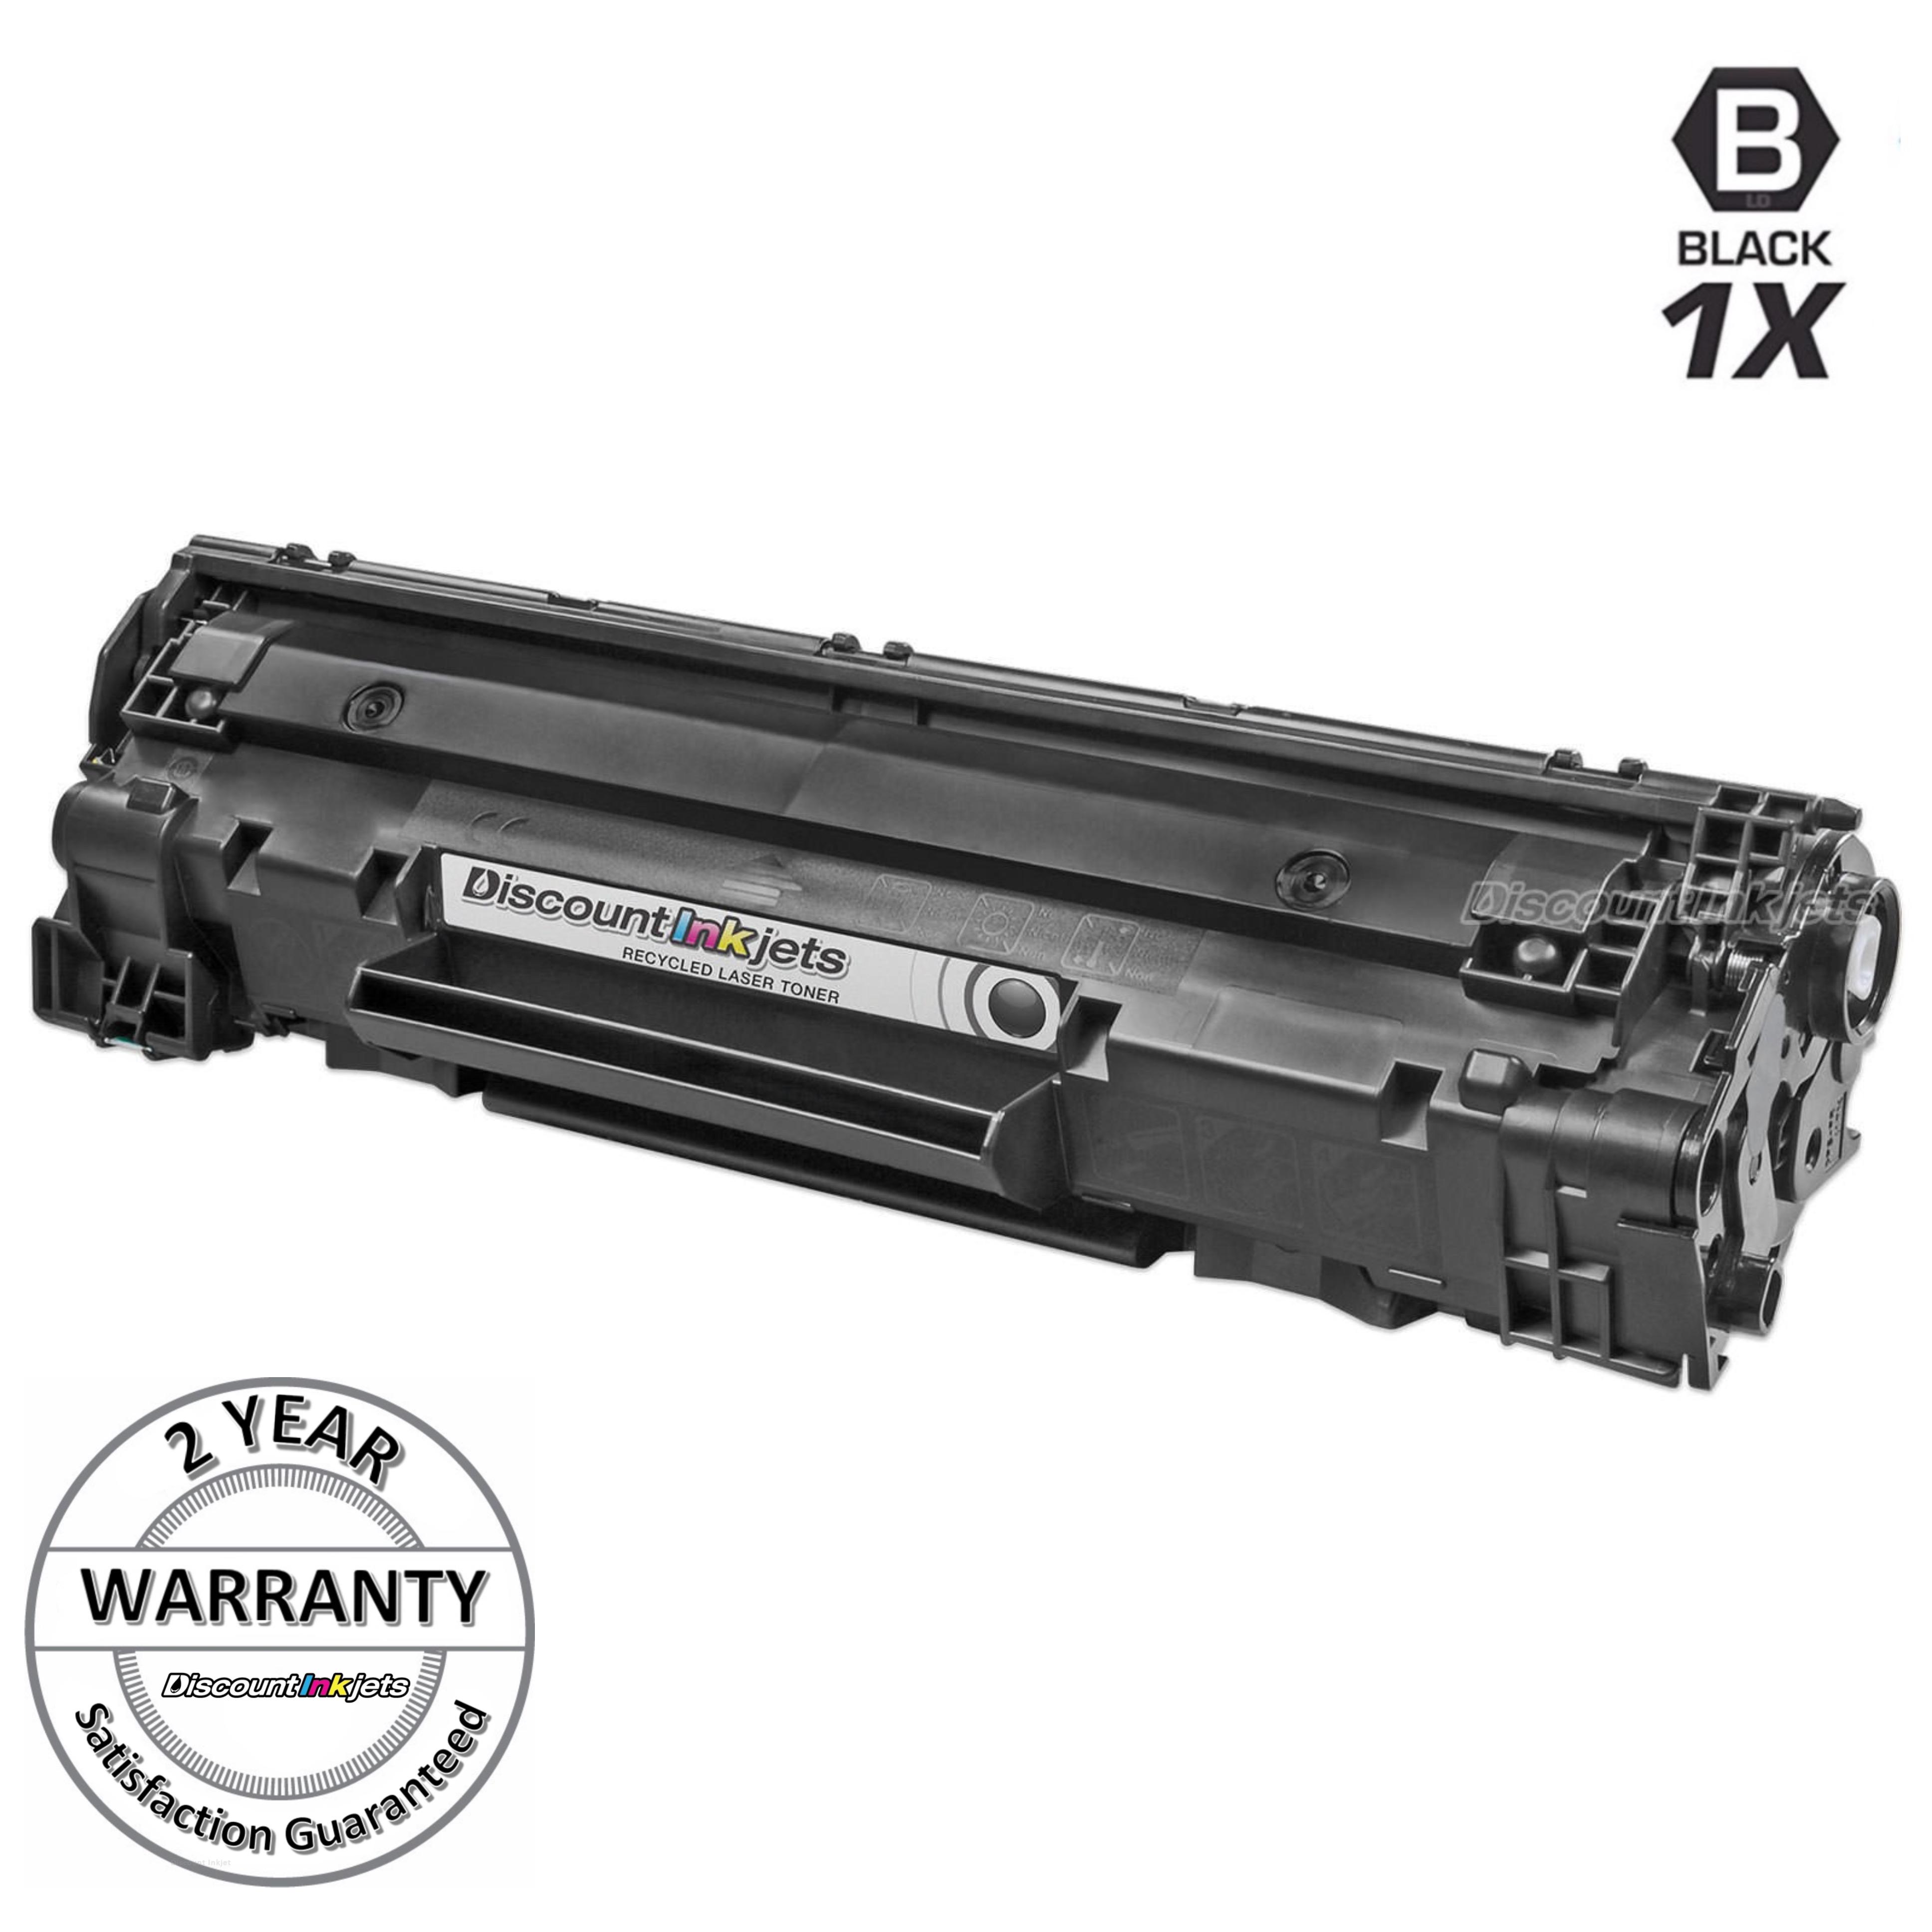 Compatible Replacement Ce285a Black Laser Toner Cartridge For Hp 85a Ce 285a Printers Laserjet P1102 P1102w M1212nf M1217nfw Mfp M1132